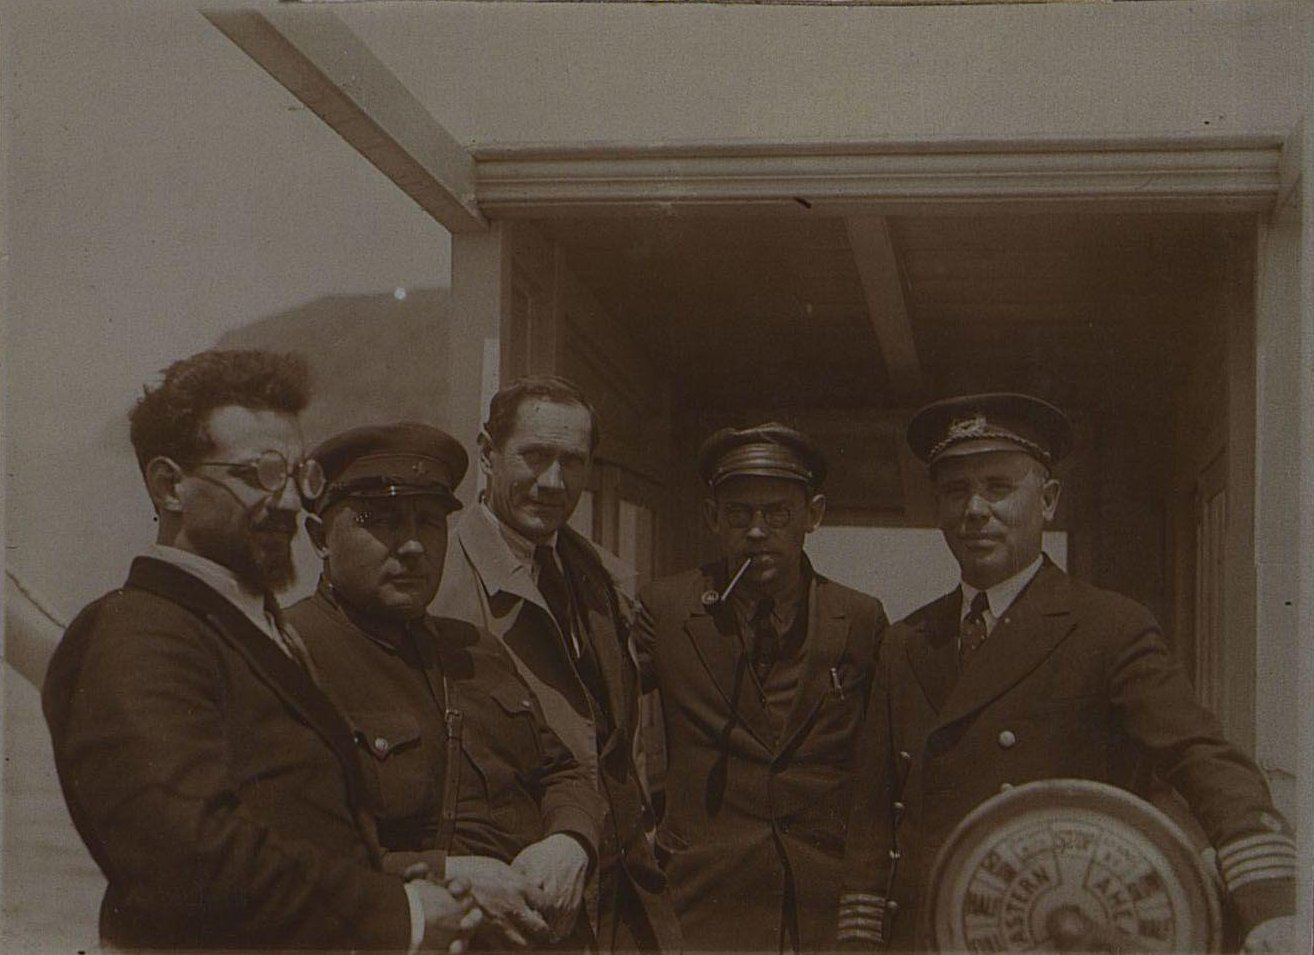 На капитанском мостике. Берзин А. П. 1931